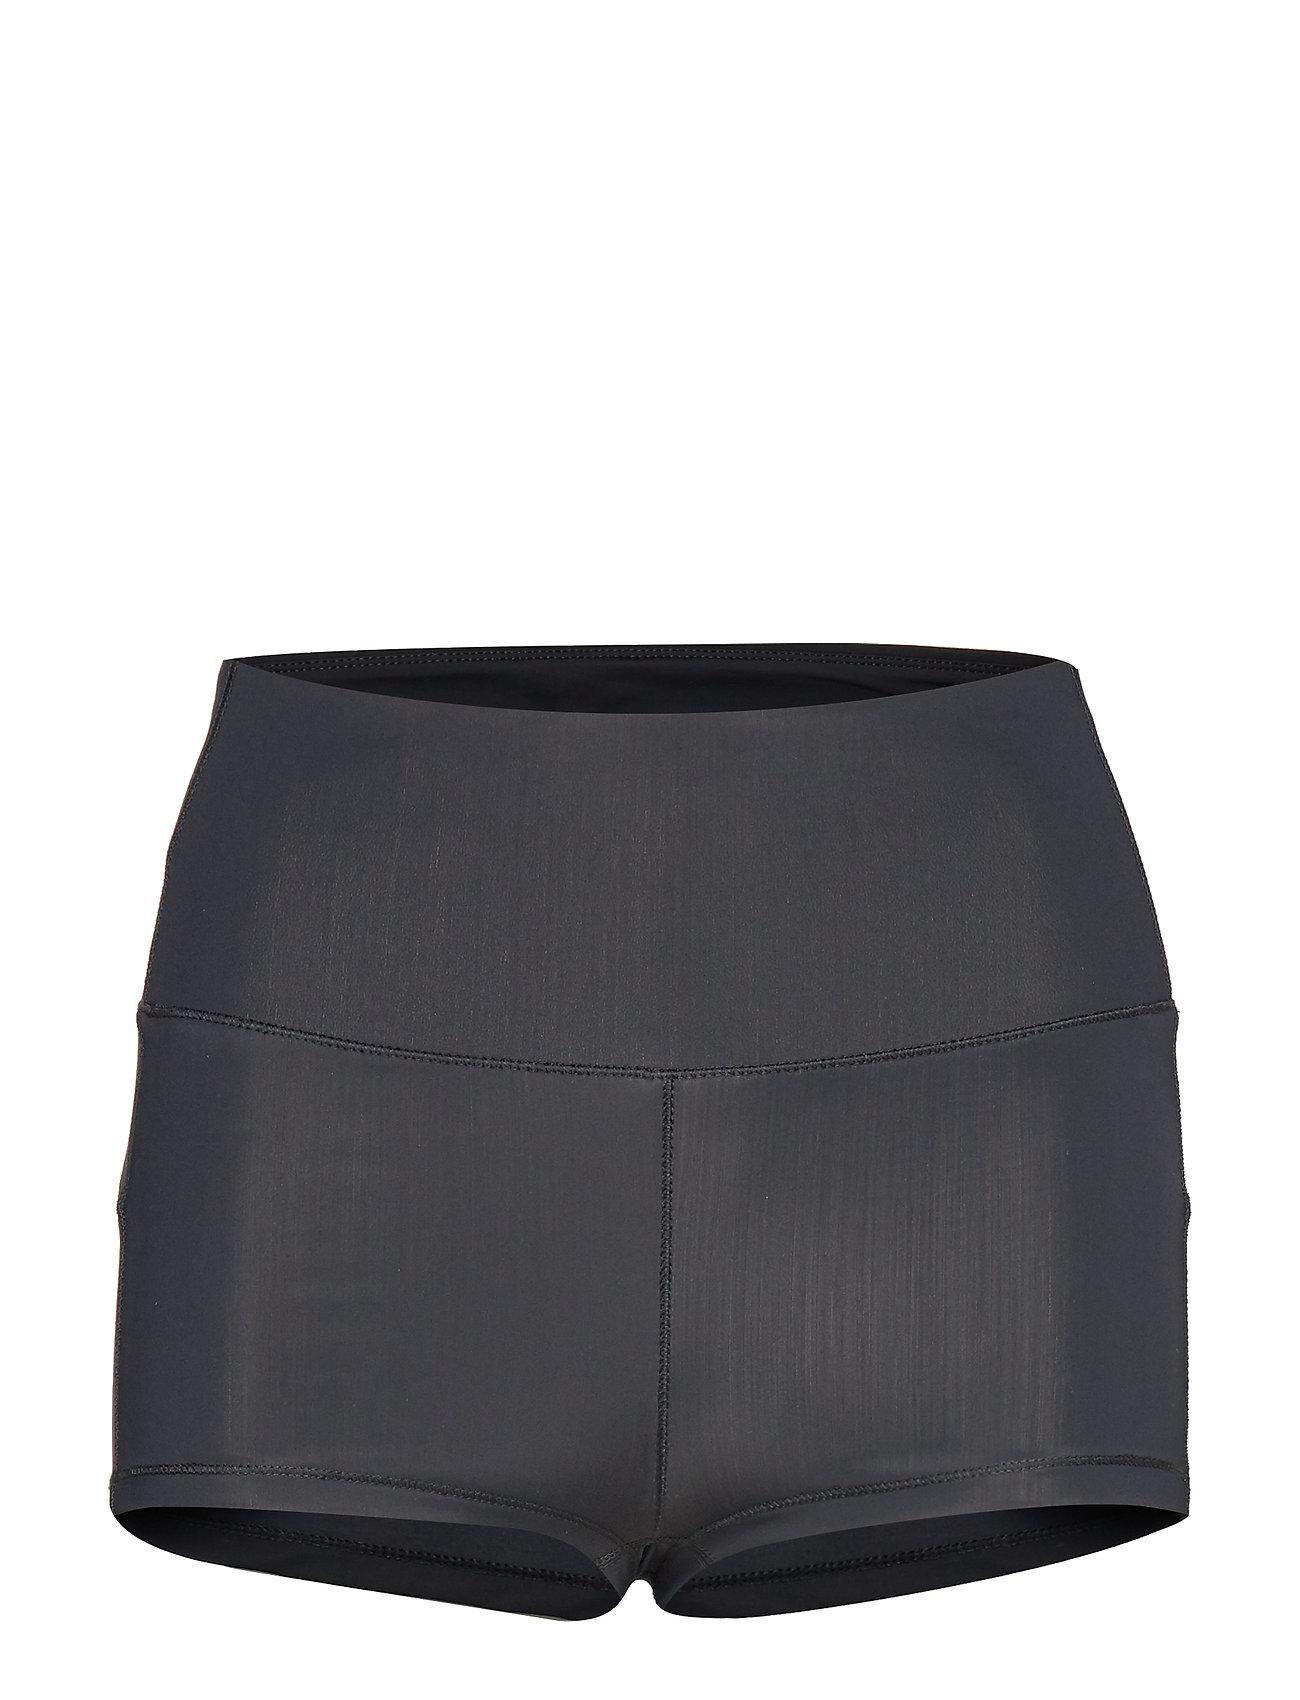 Casall Conscious Hotpants - BLACK